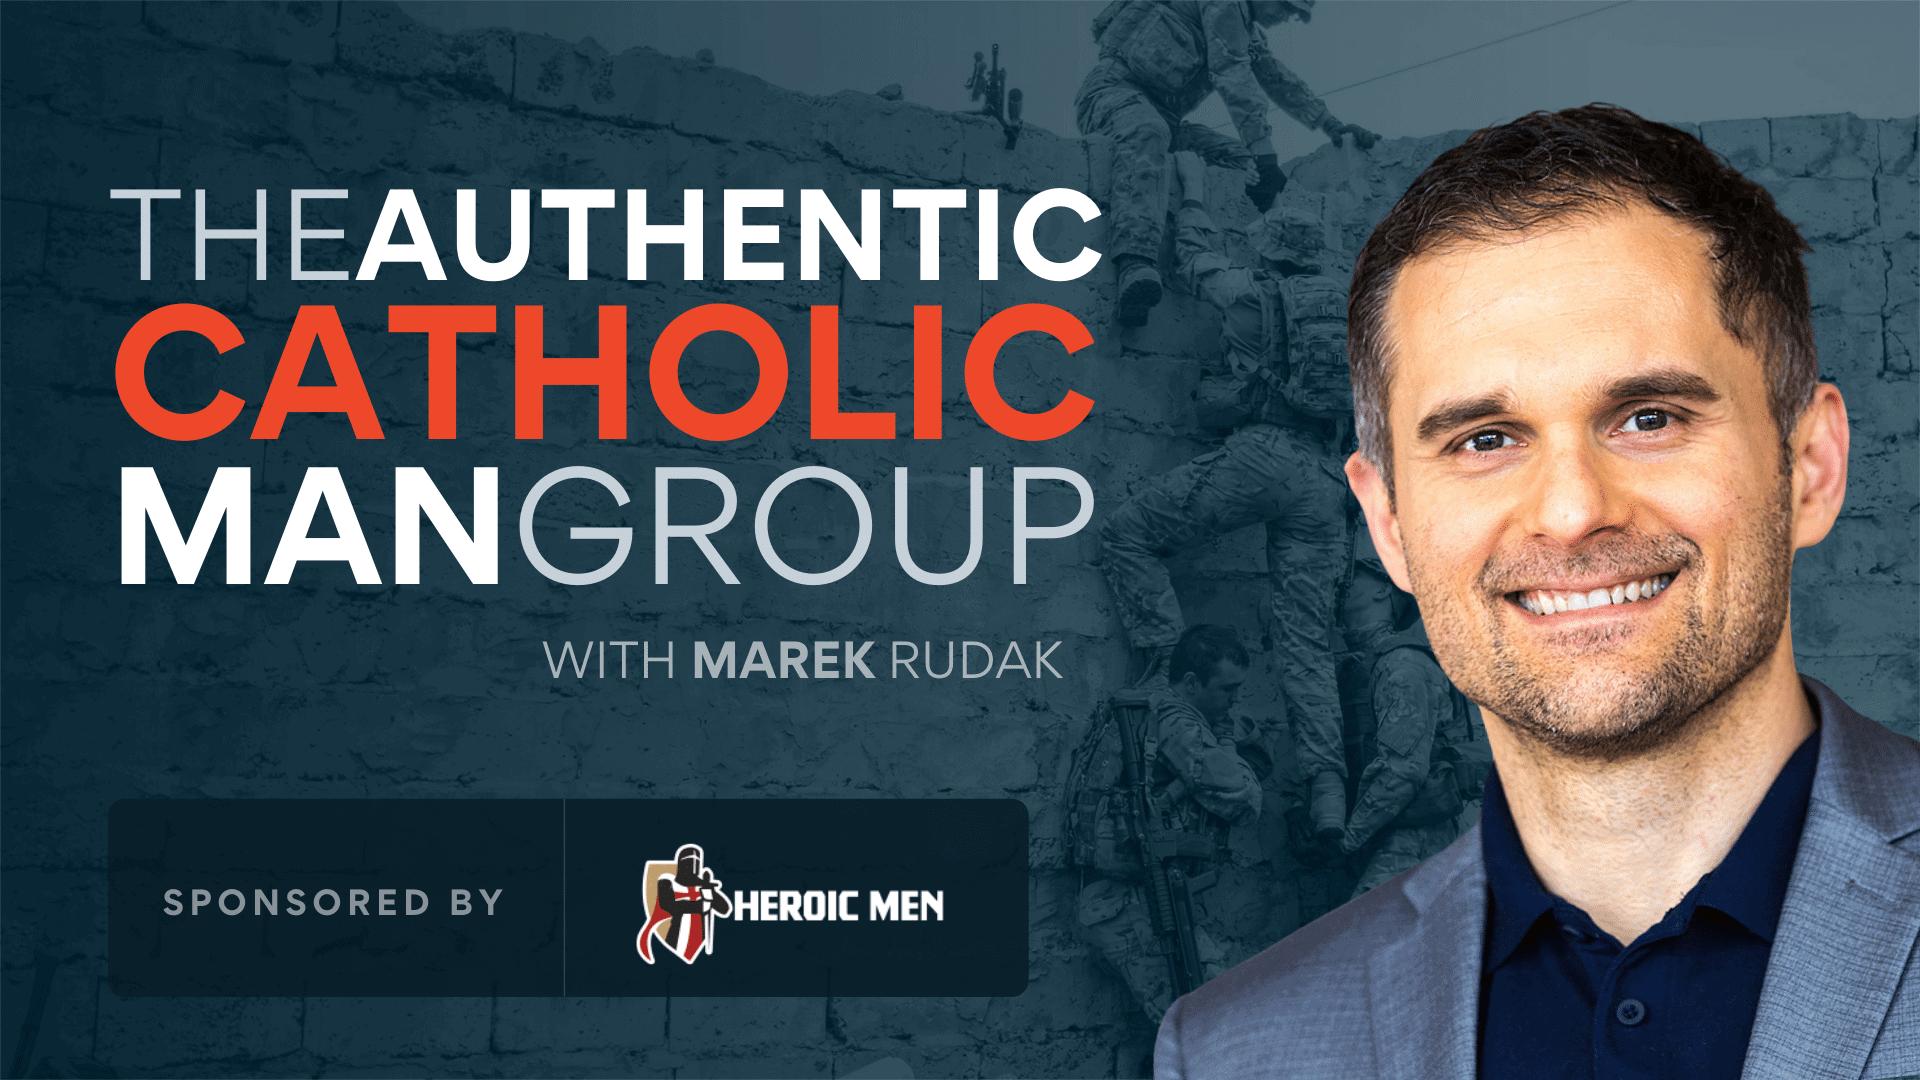 The Authentic Catholic Man